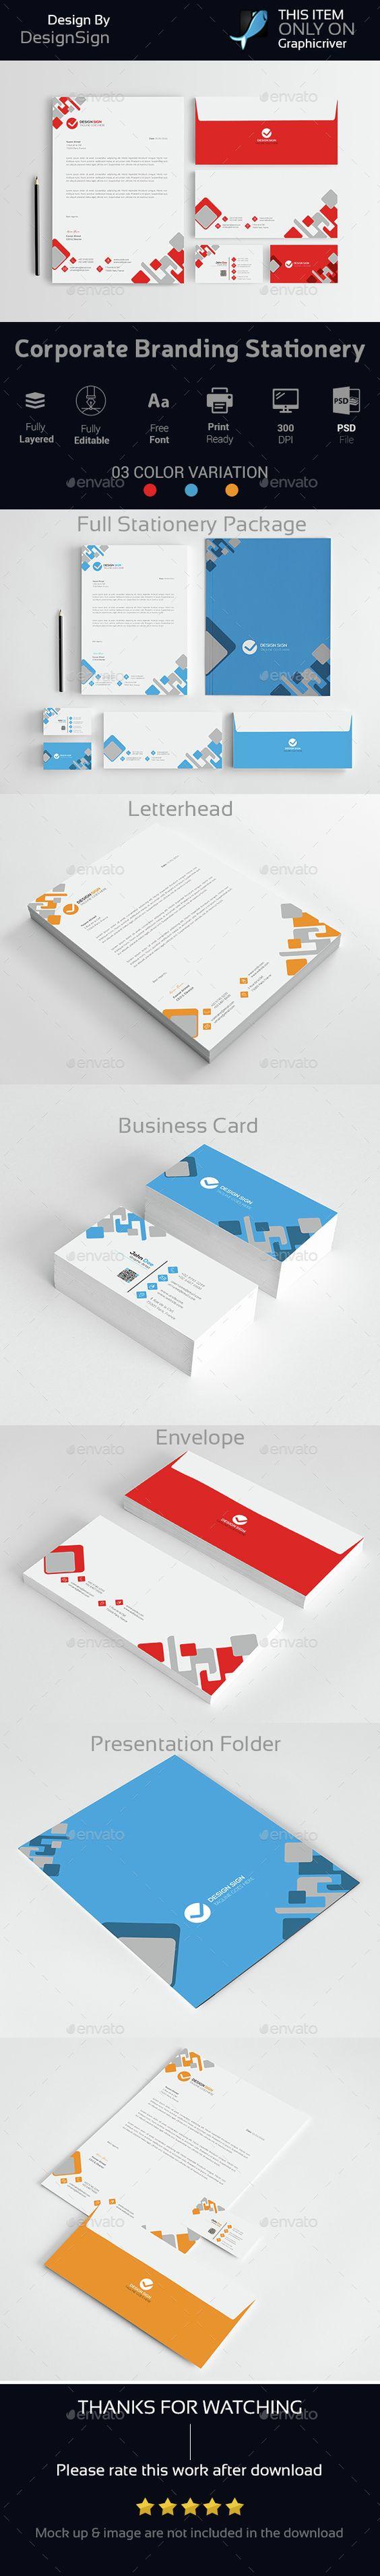 Corporate Branding Stationery Vol-03